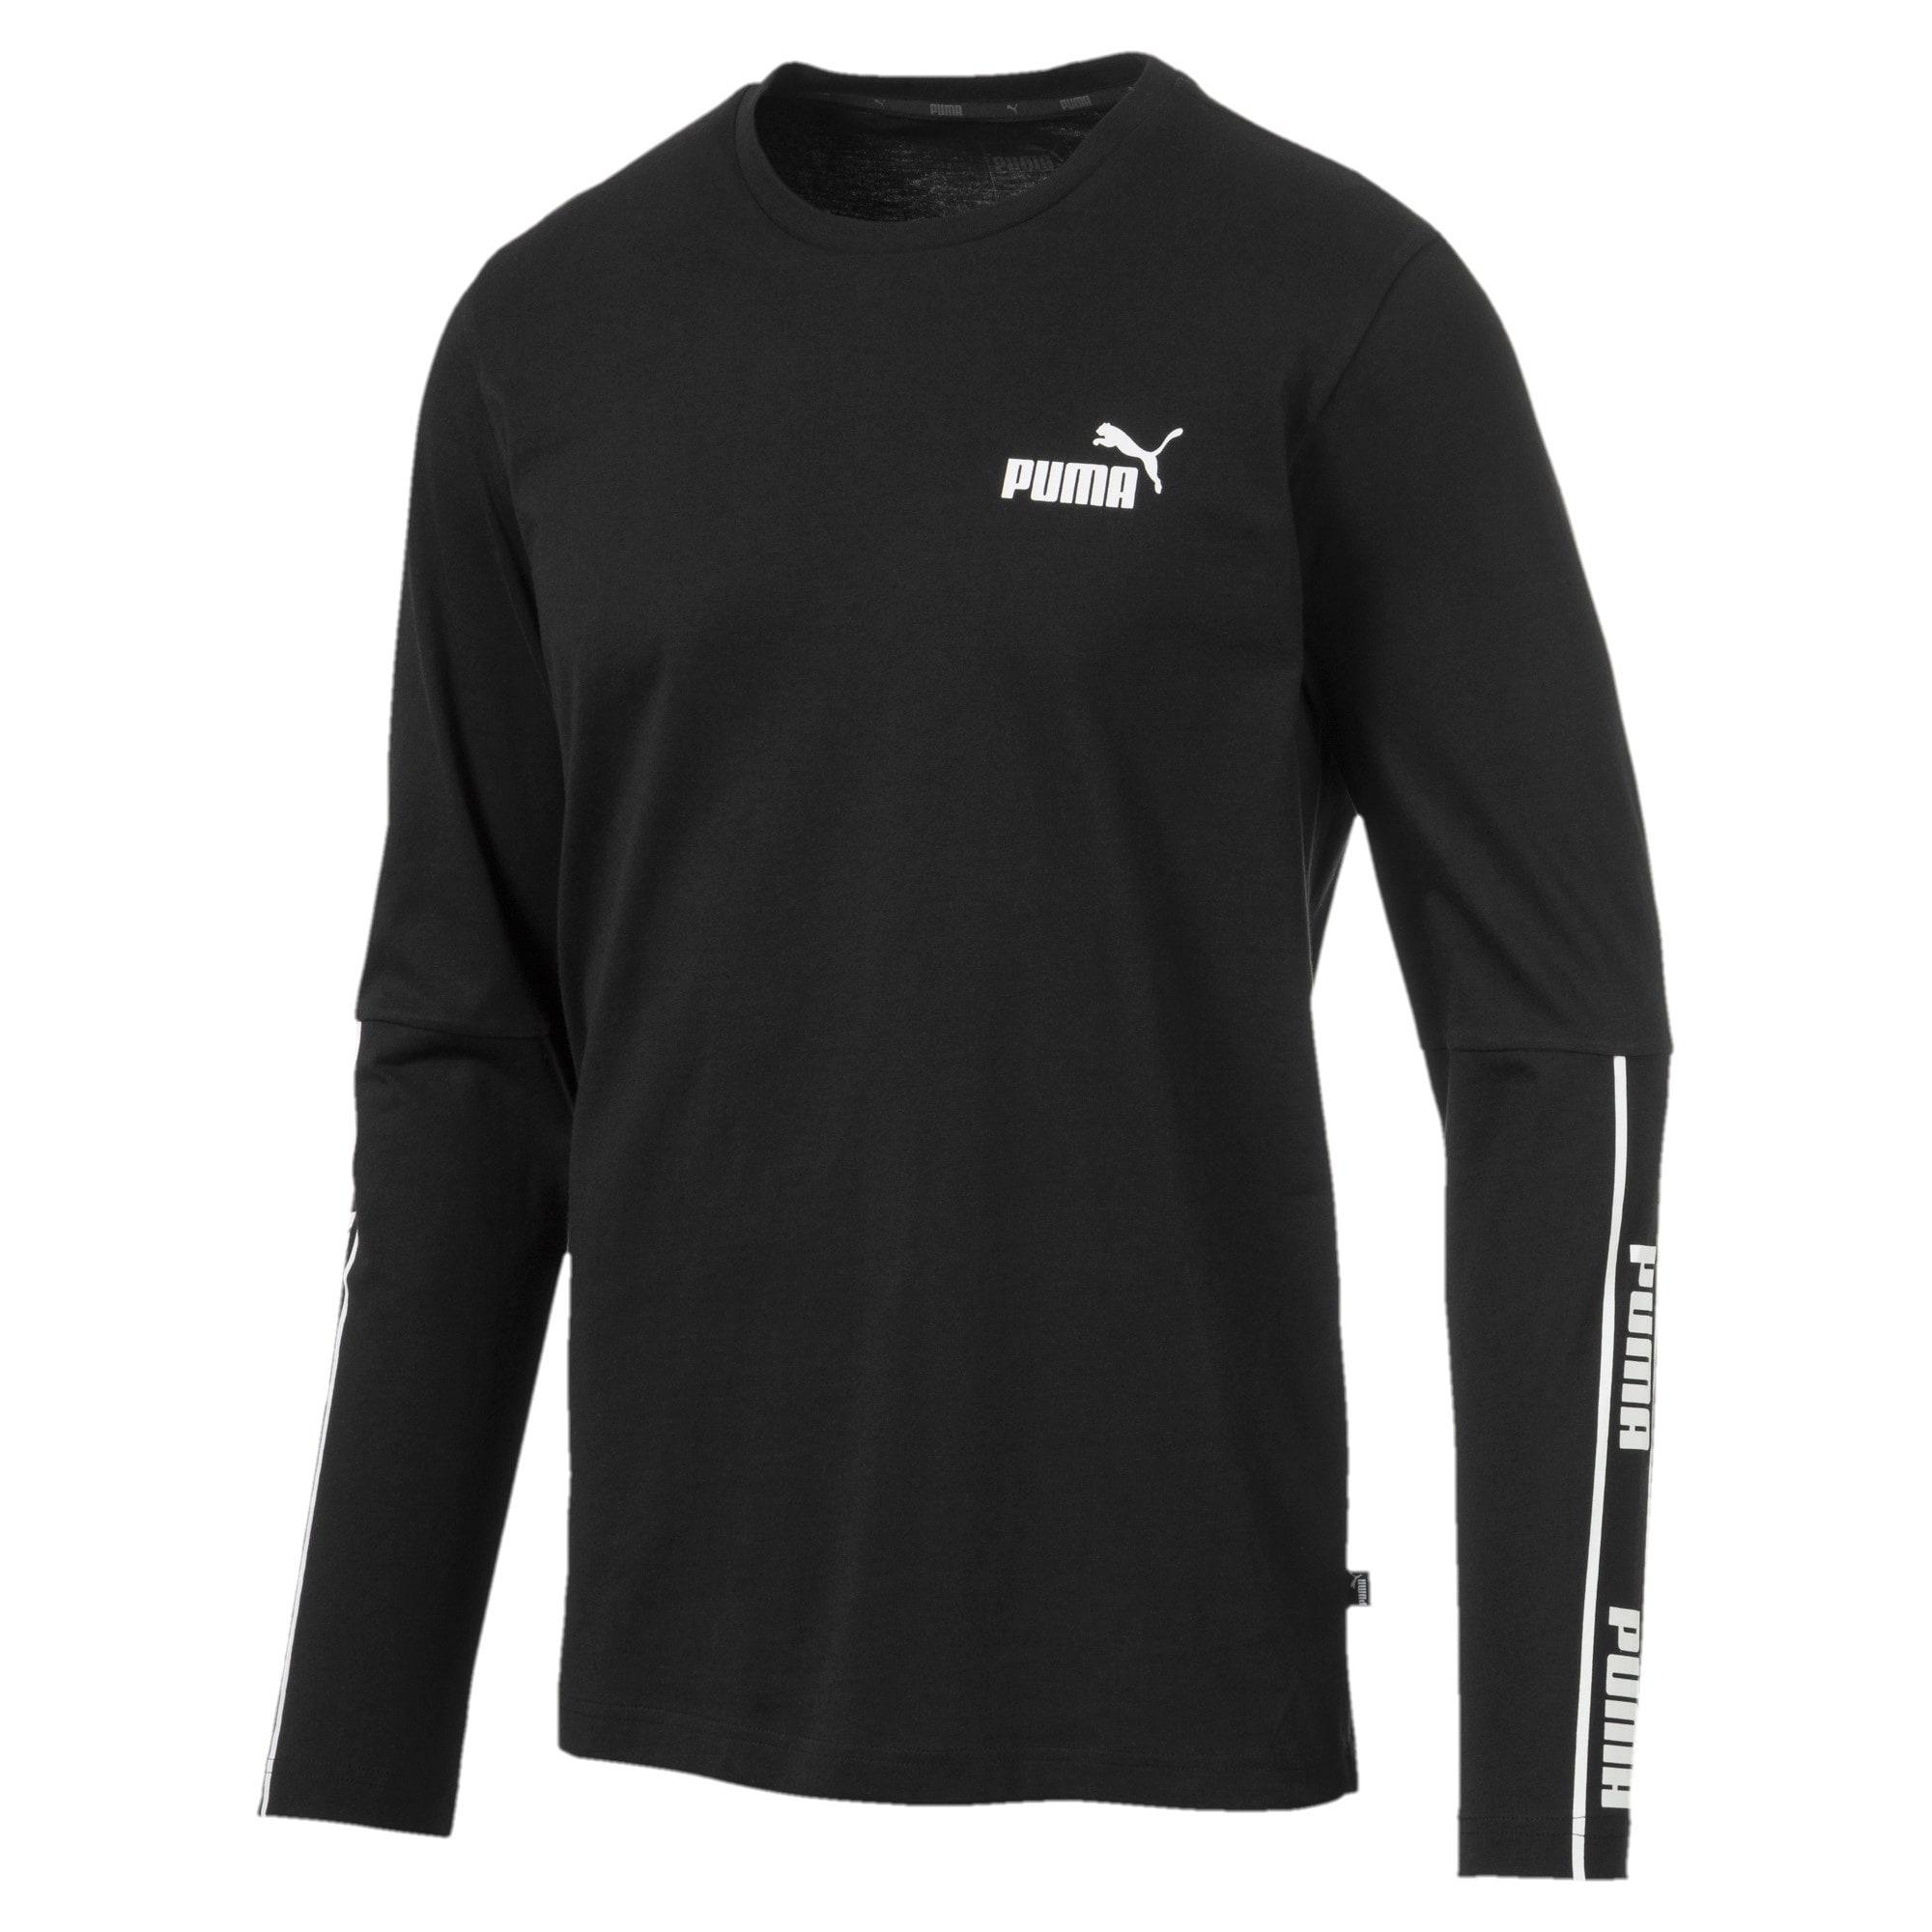 Miniatura 1 de Camiseta de mangas largas Amplified para hombre, Puma Black, mediano